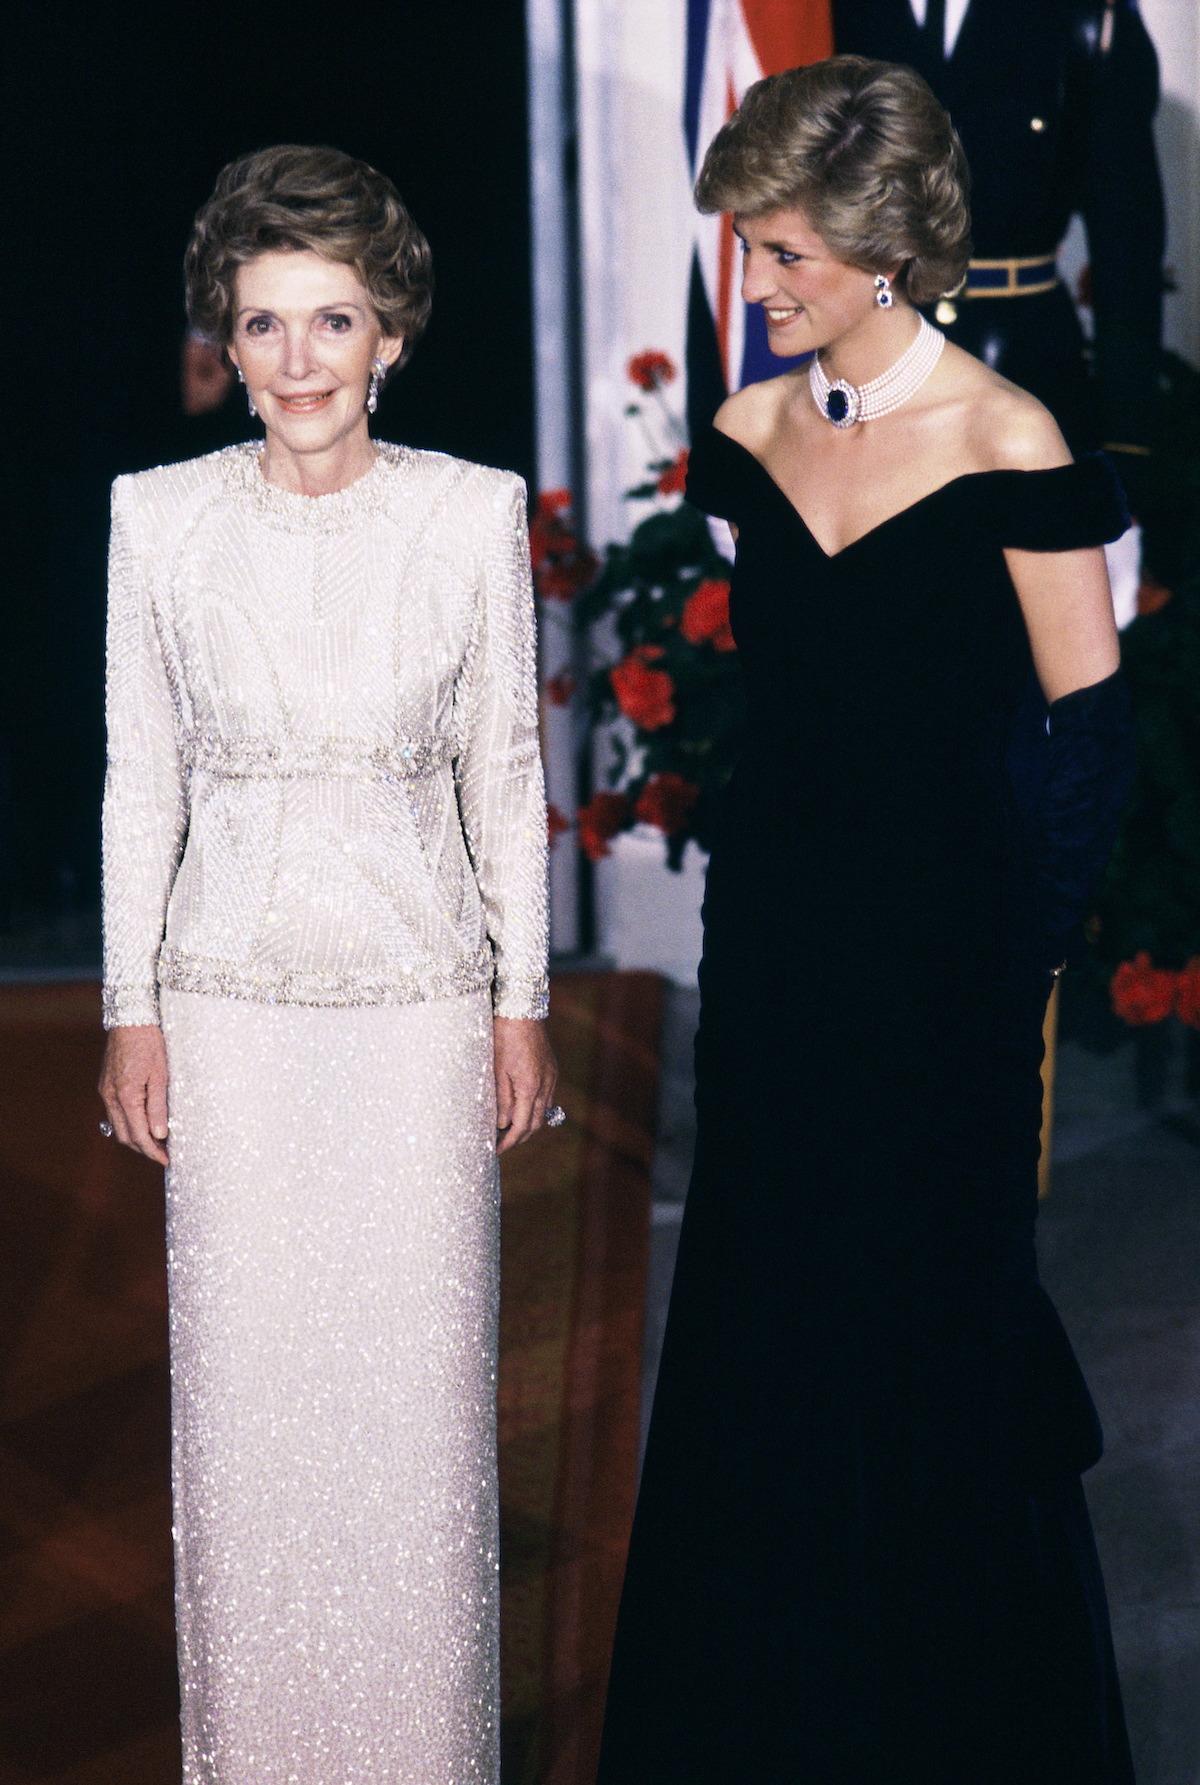 Nancy Reagan and Princess Diana in formalwear